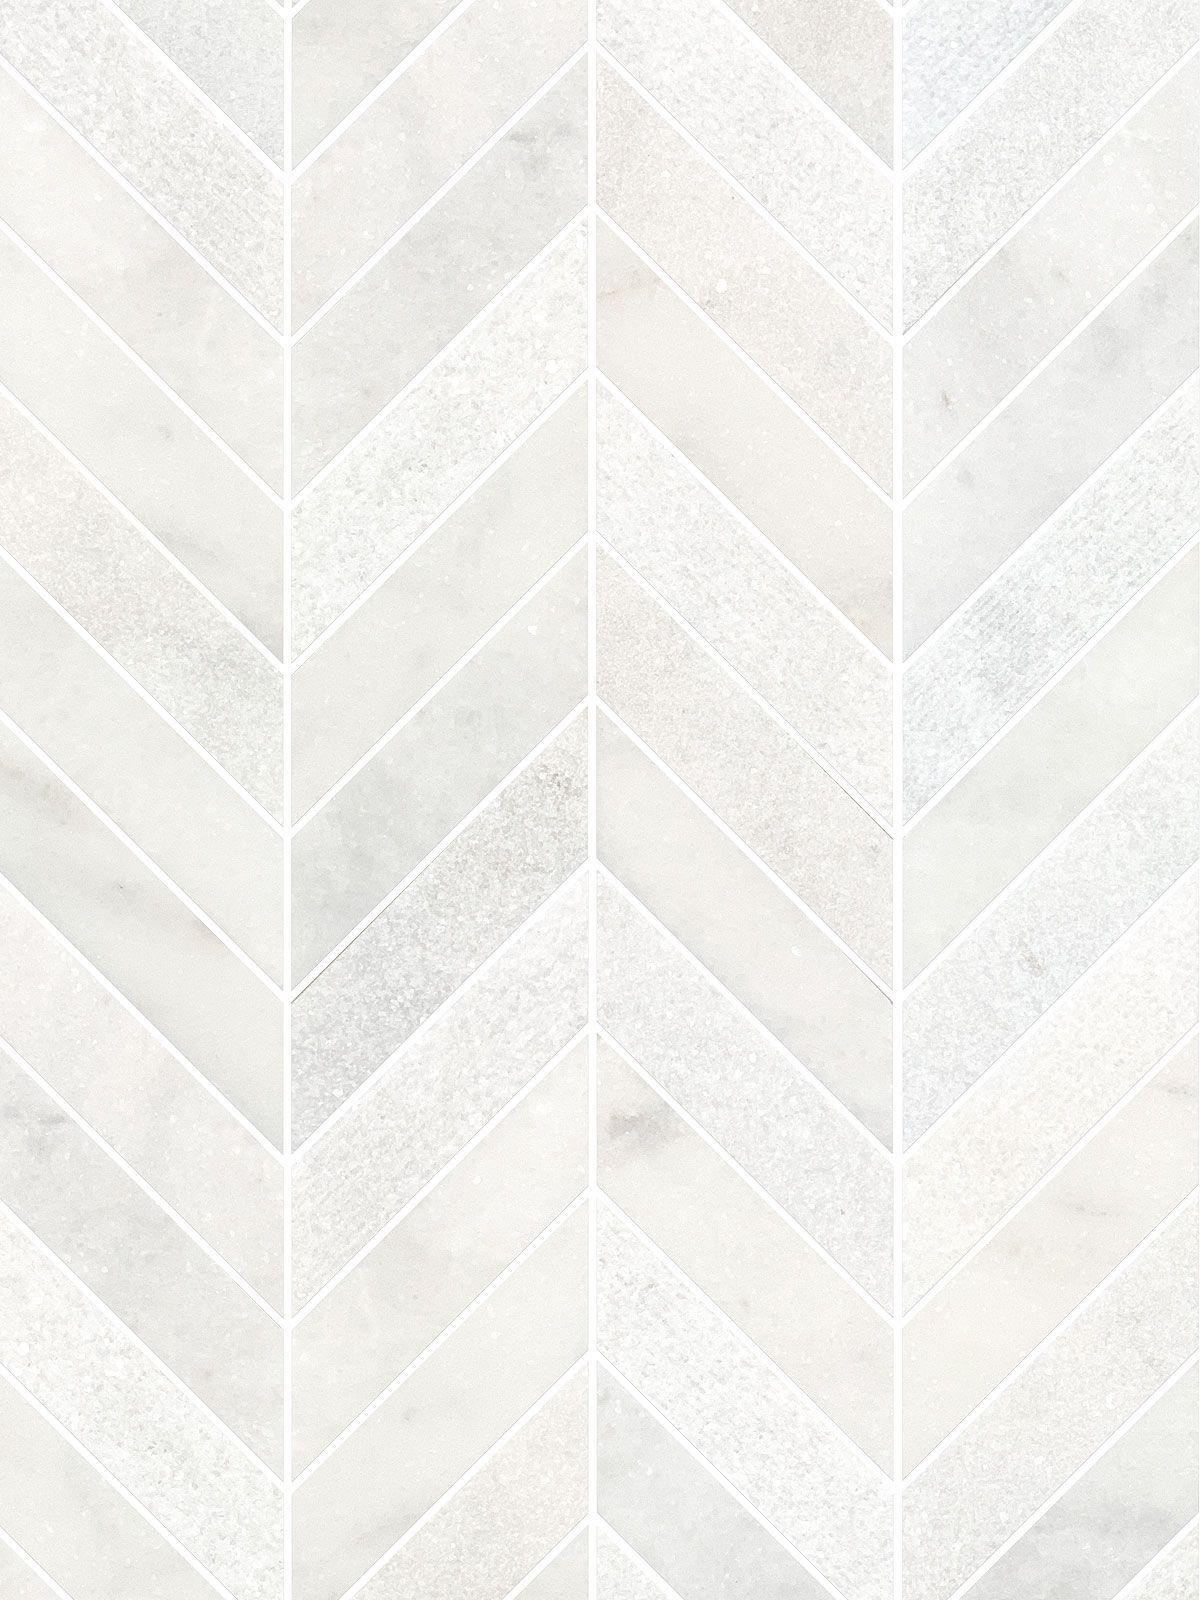 White Modern Marble Chevron Mosaic Backsplash Tile Ba631613 White Tile Backsplash Mosaic Backsplash Tile Backsplash